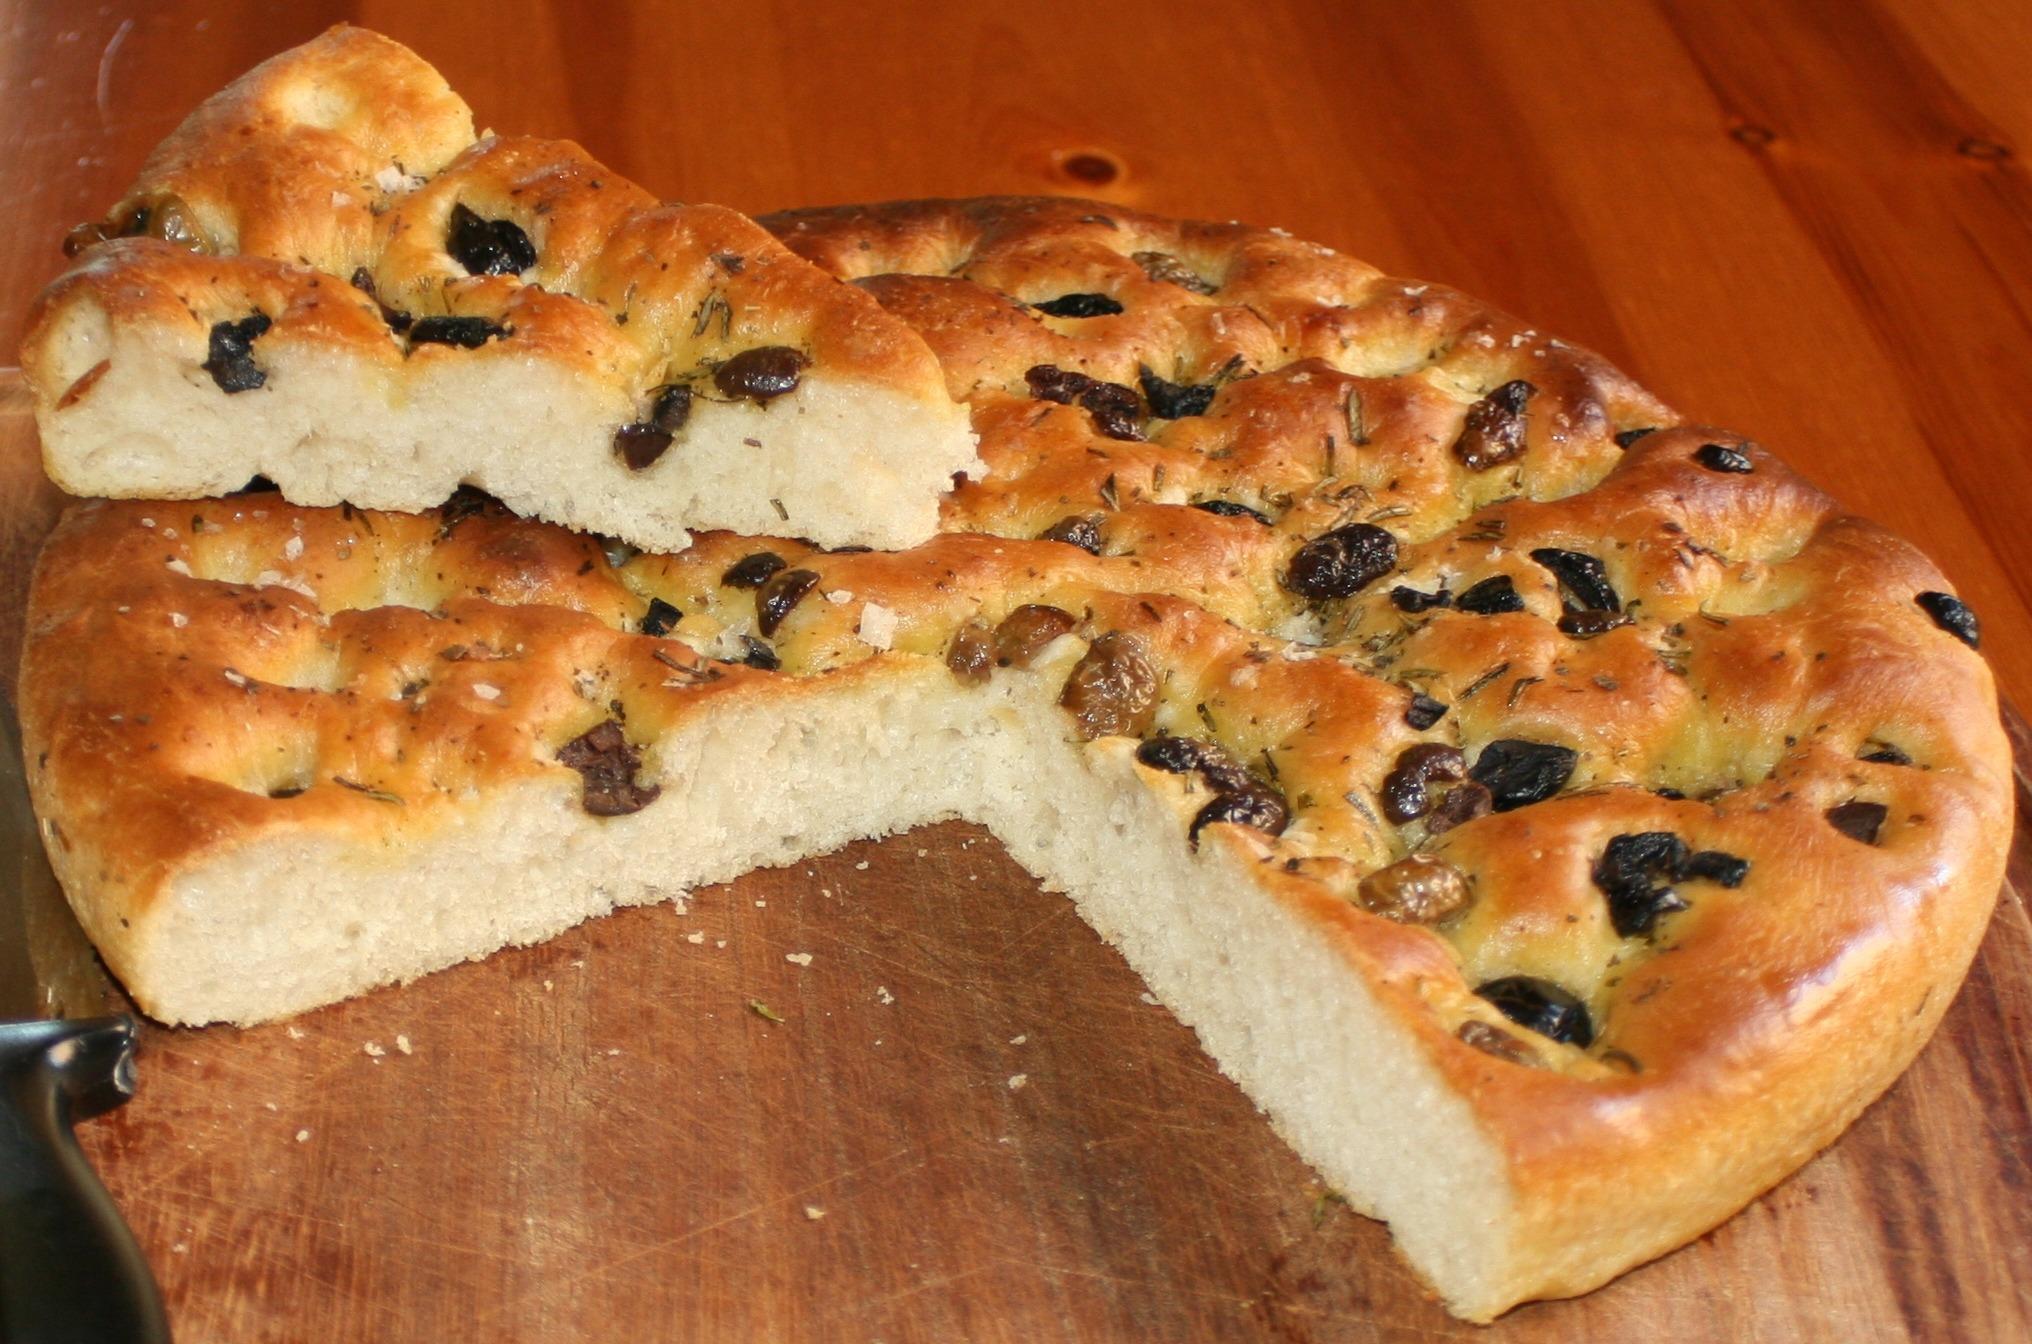 Low Carb Carbalose Flour Focaccia Bread - Low-Carb Scams